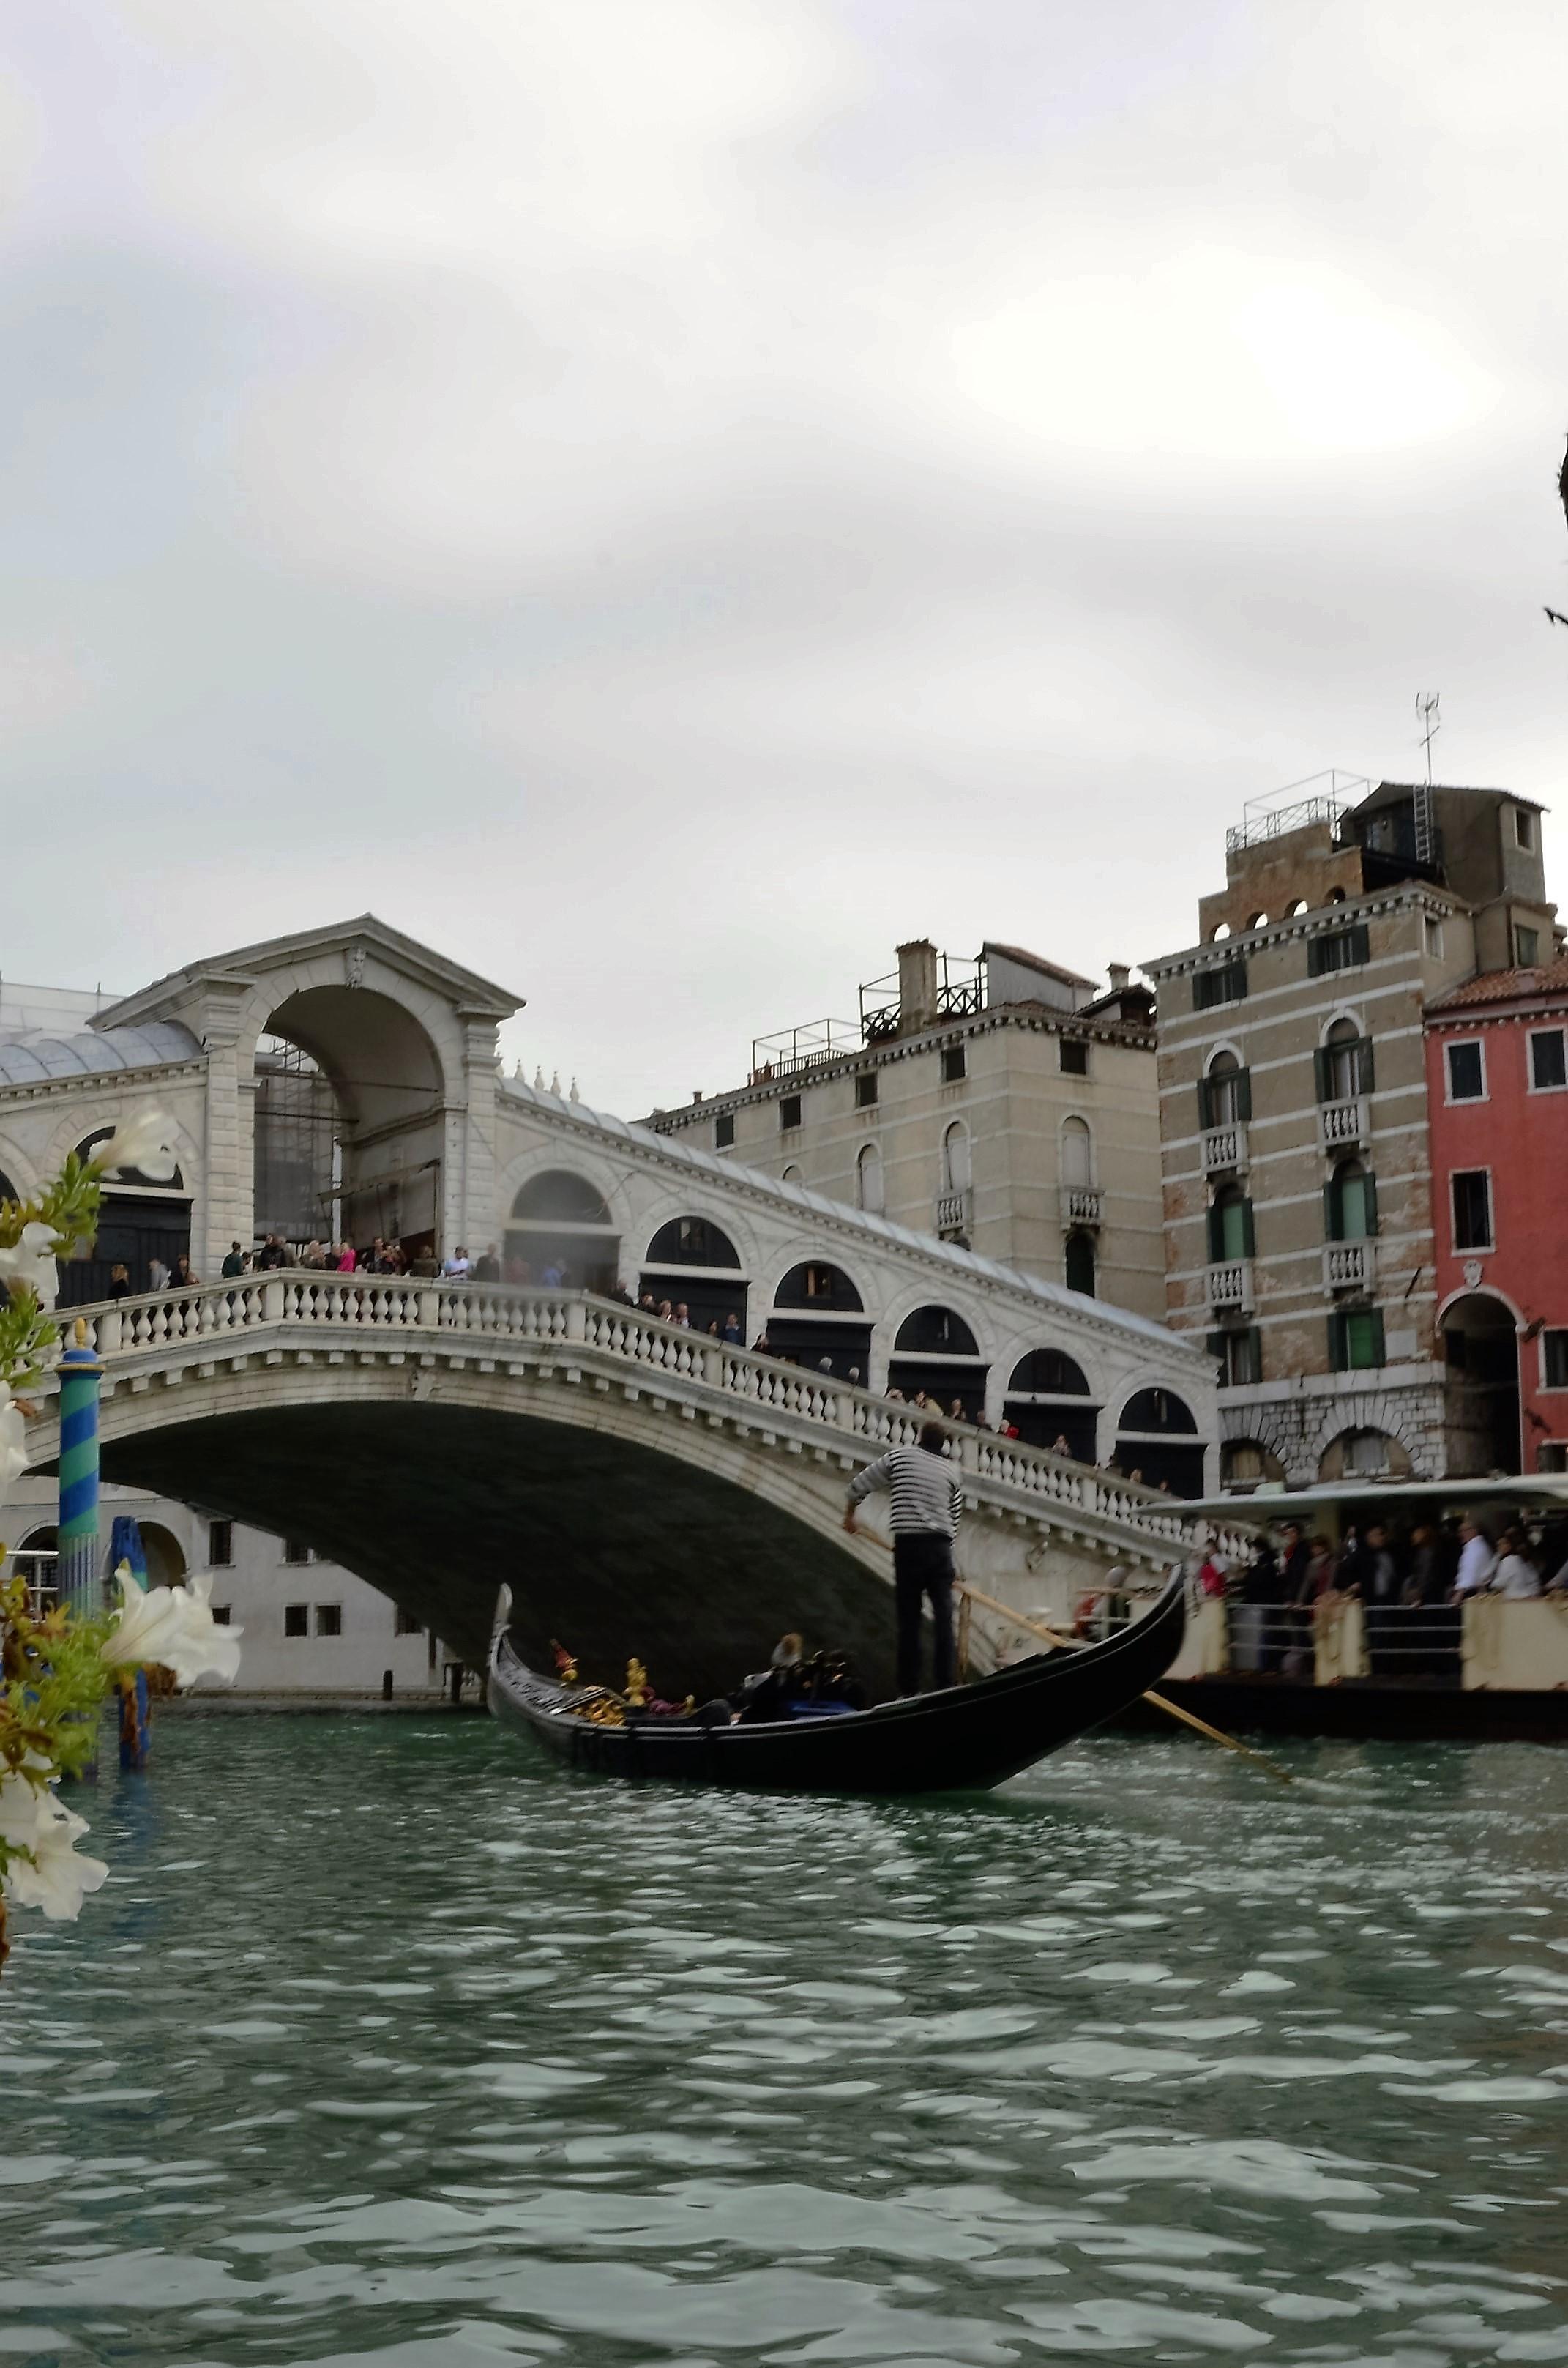 Wenecja przewodnik, przewodnik Wenecja, Wenecja wycieczki